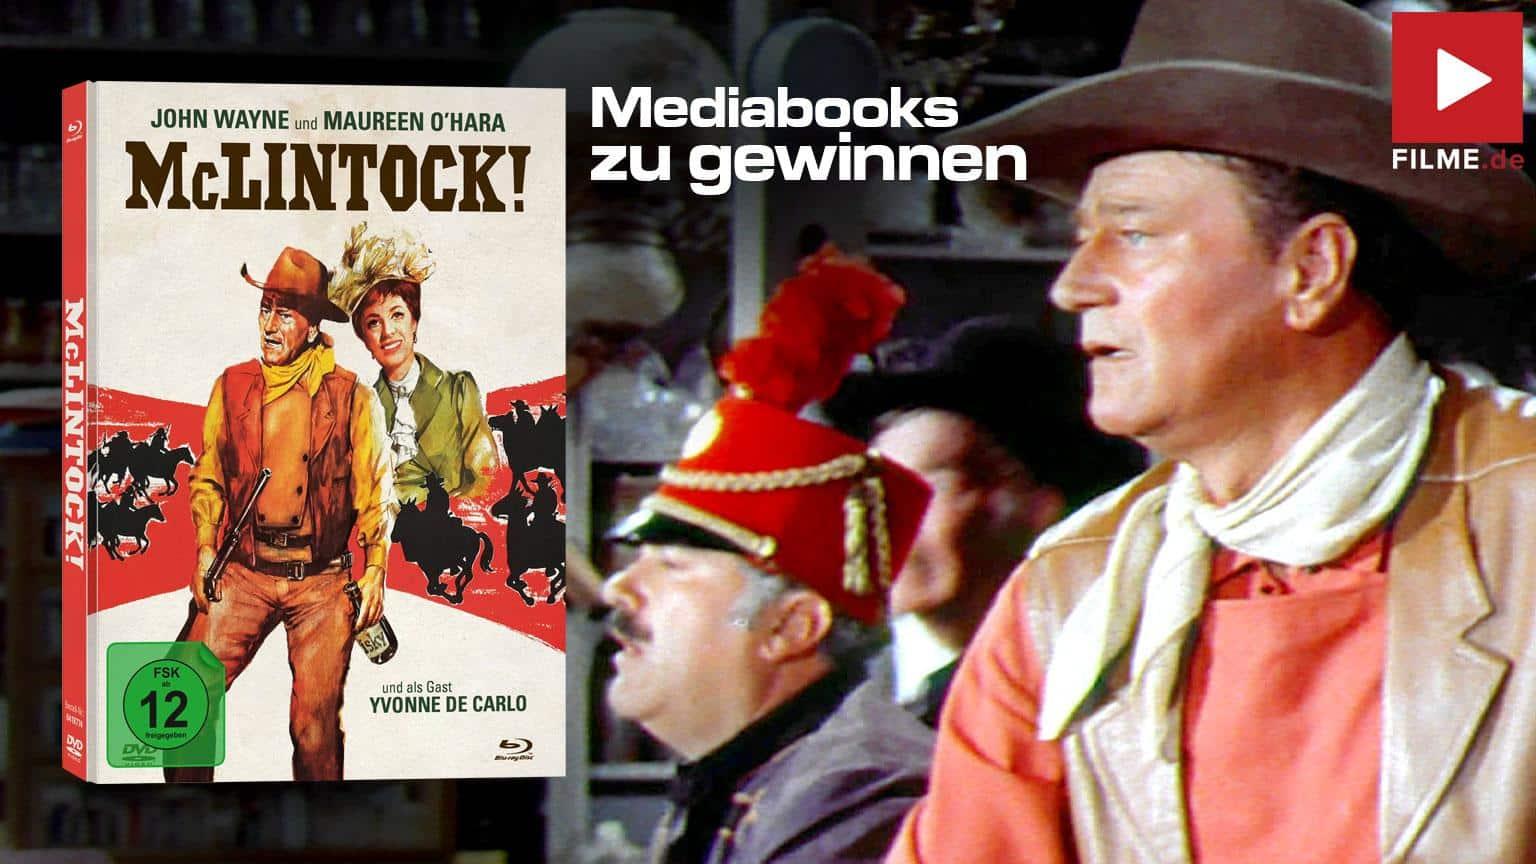 McLintock! Gewinnspiel Artikelbild Mediabook